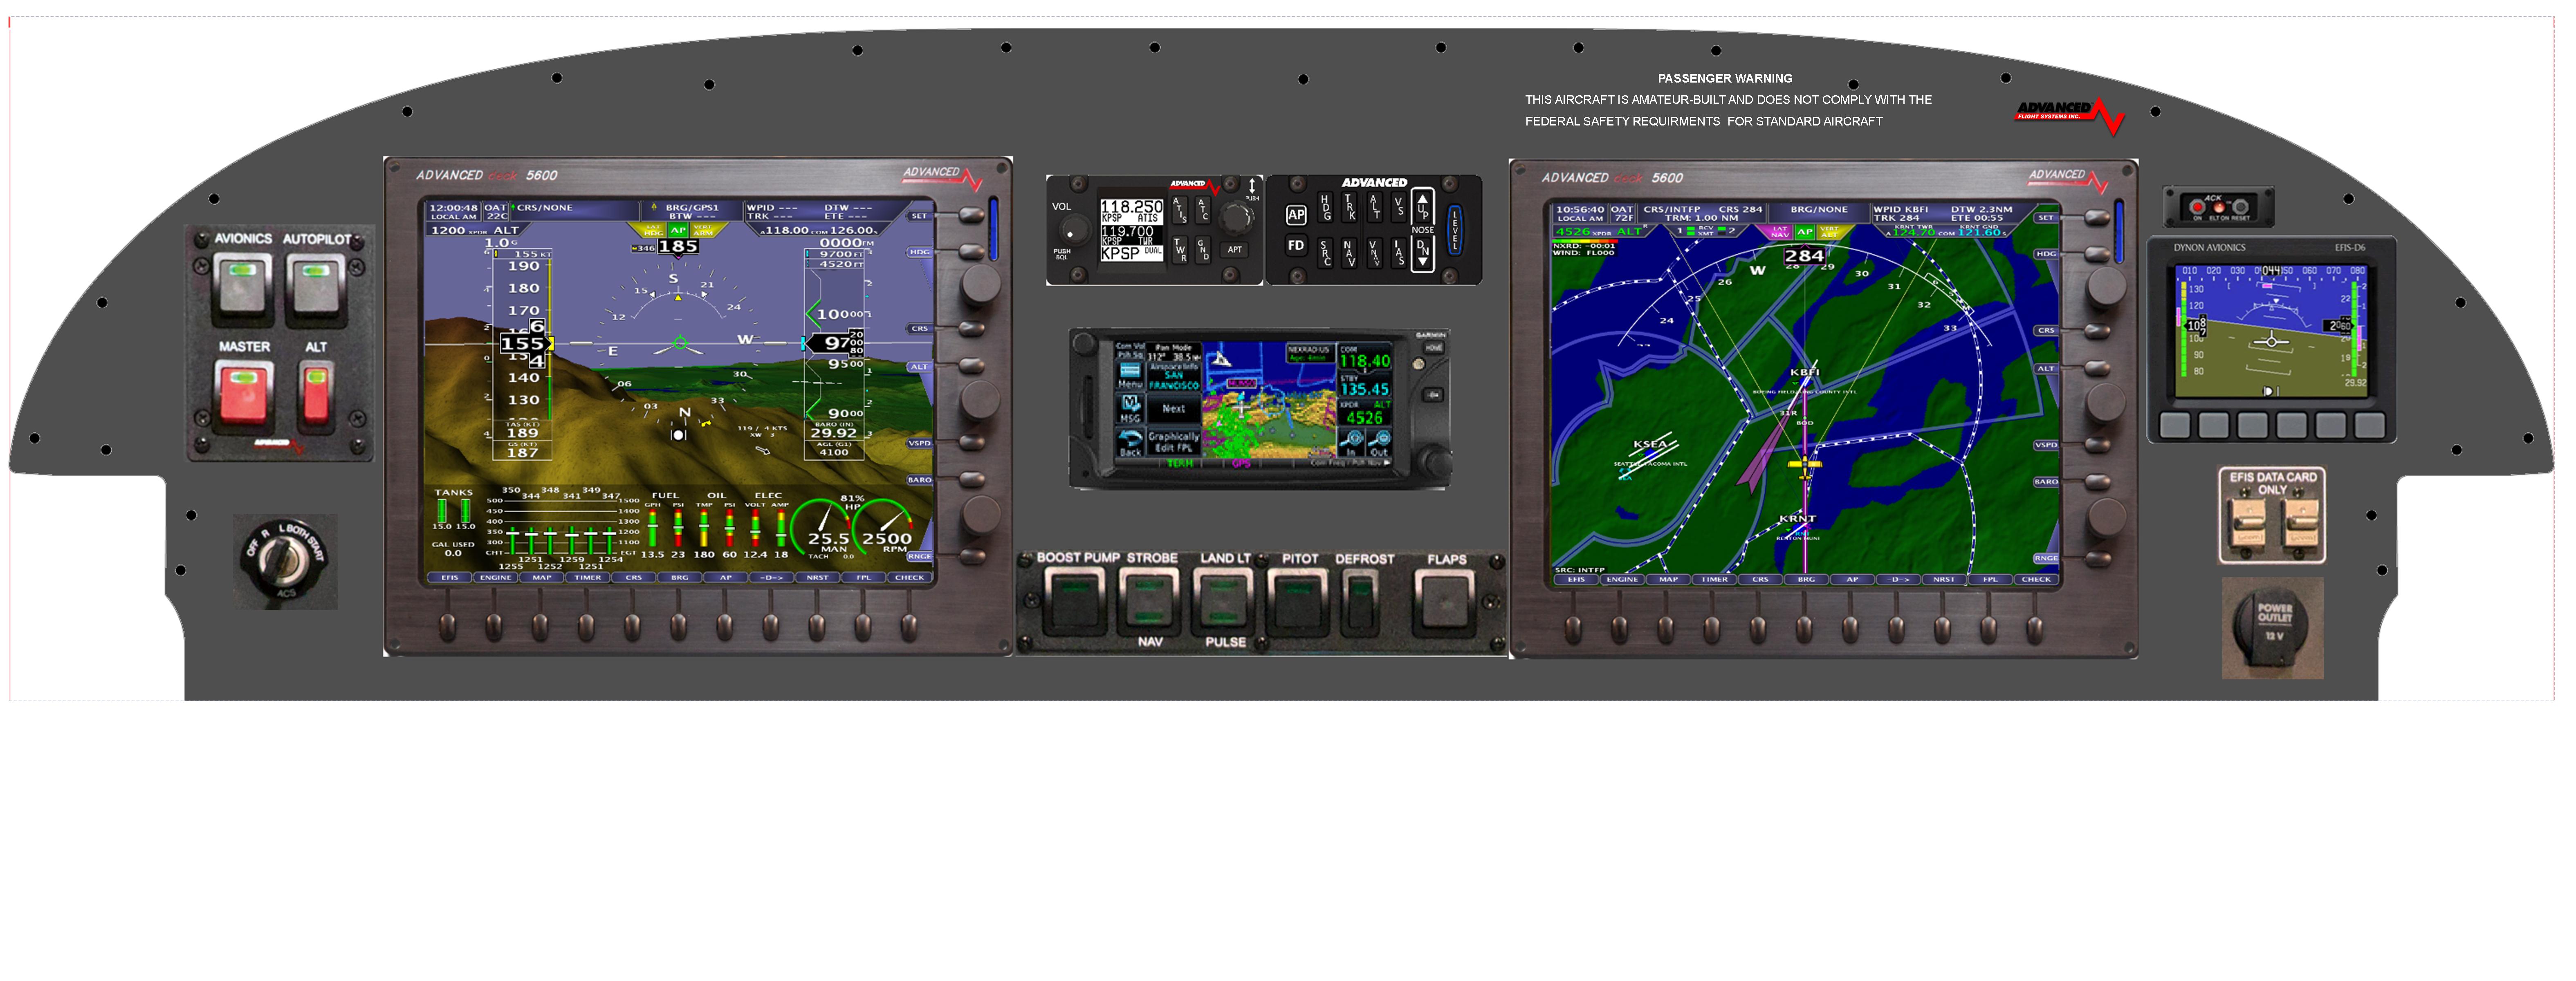 Advanced Flight Systems Rv Wiring Harness Diagram Panel Options